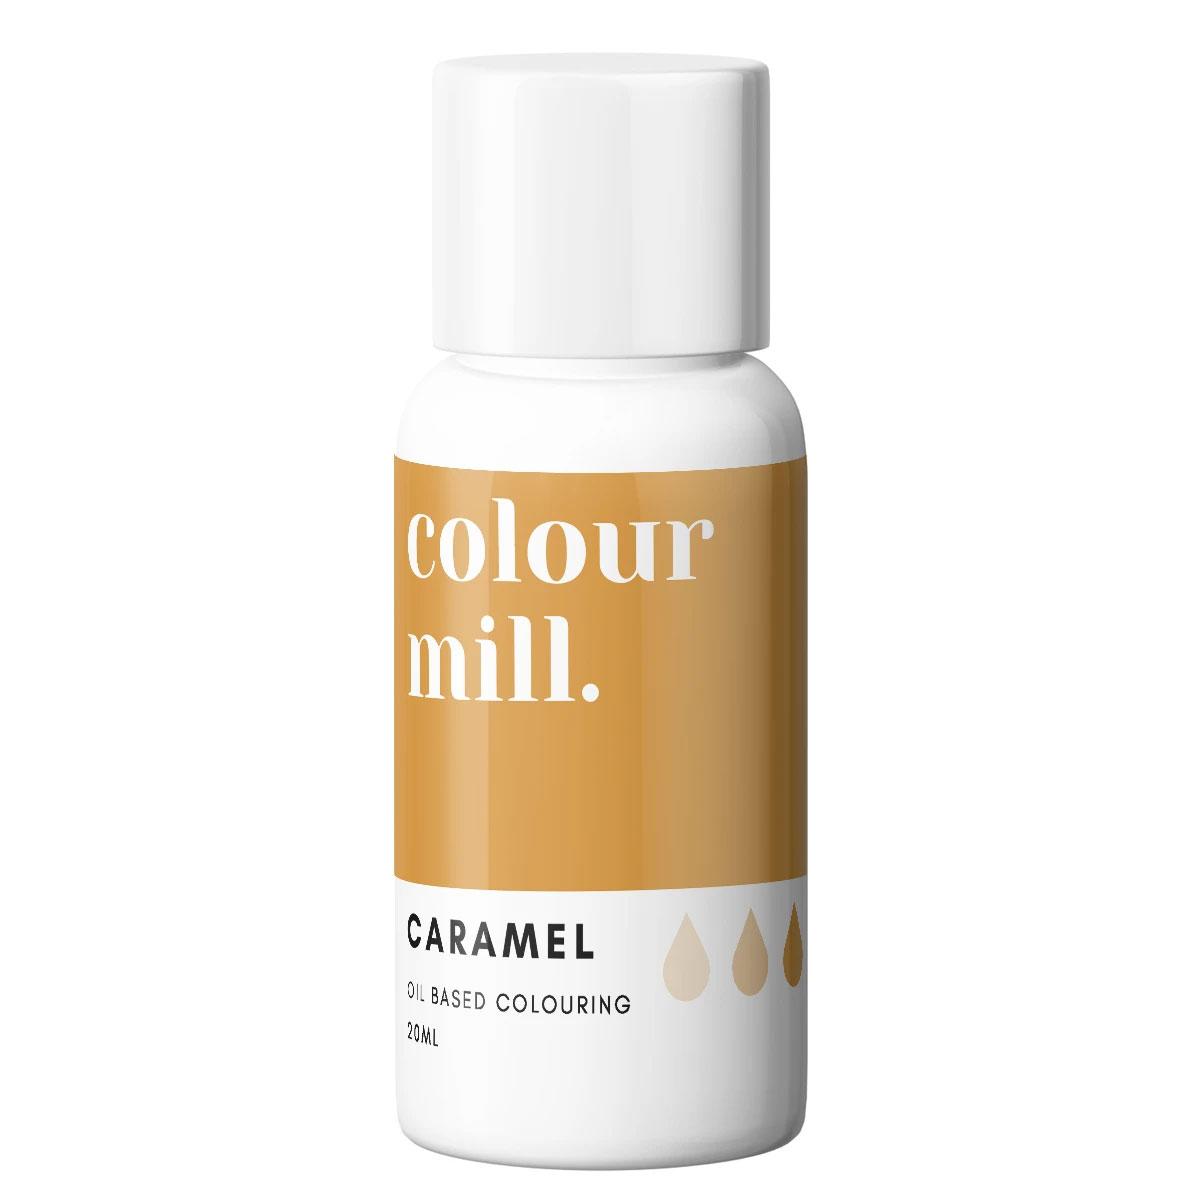 Colour Mill fettlösliche Lebensmittelfarbe - Caramel 20ml